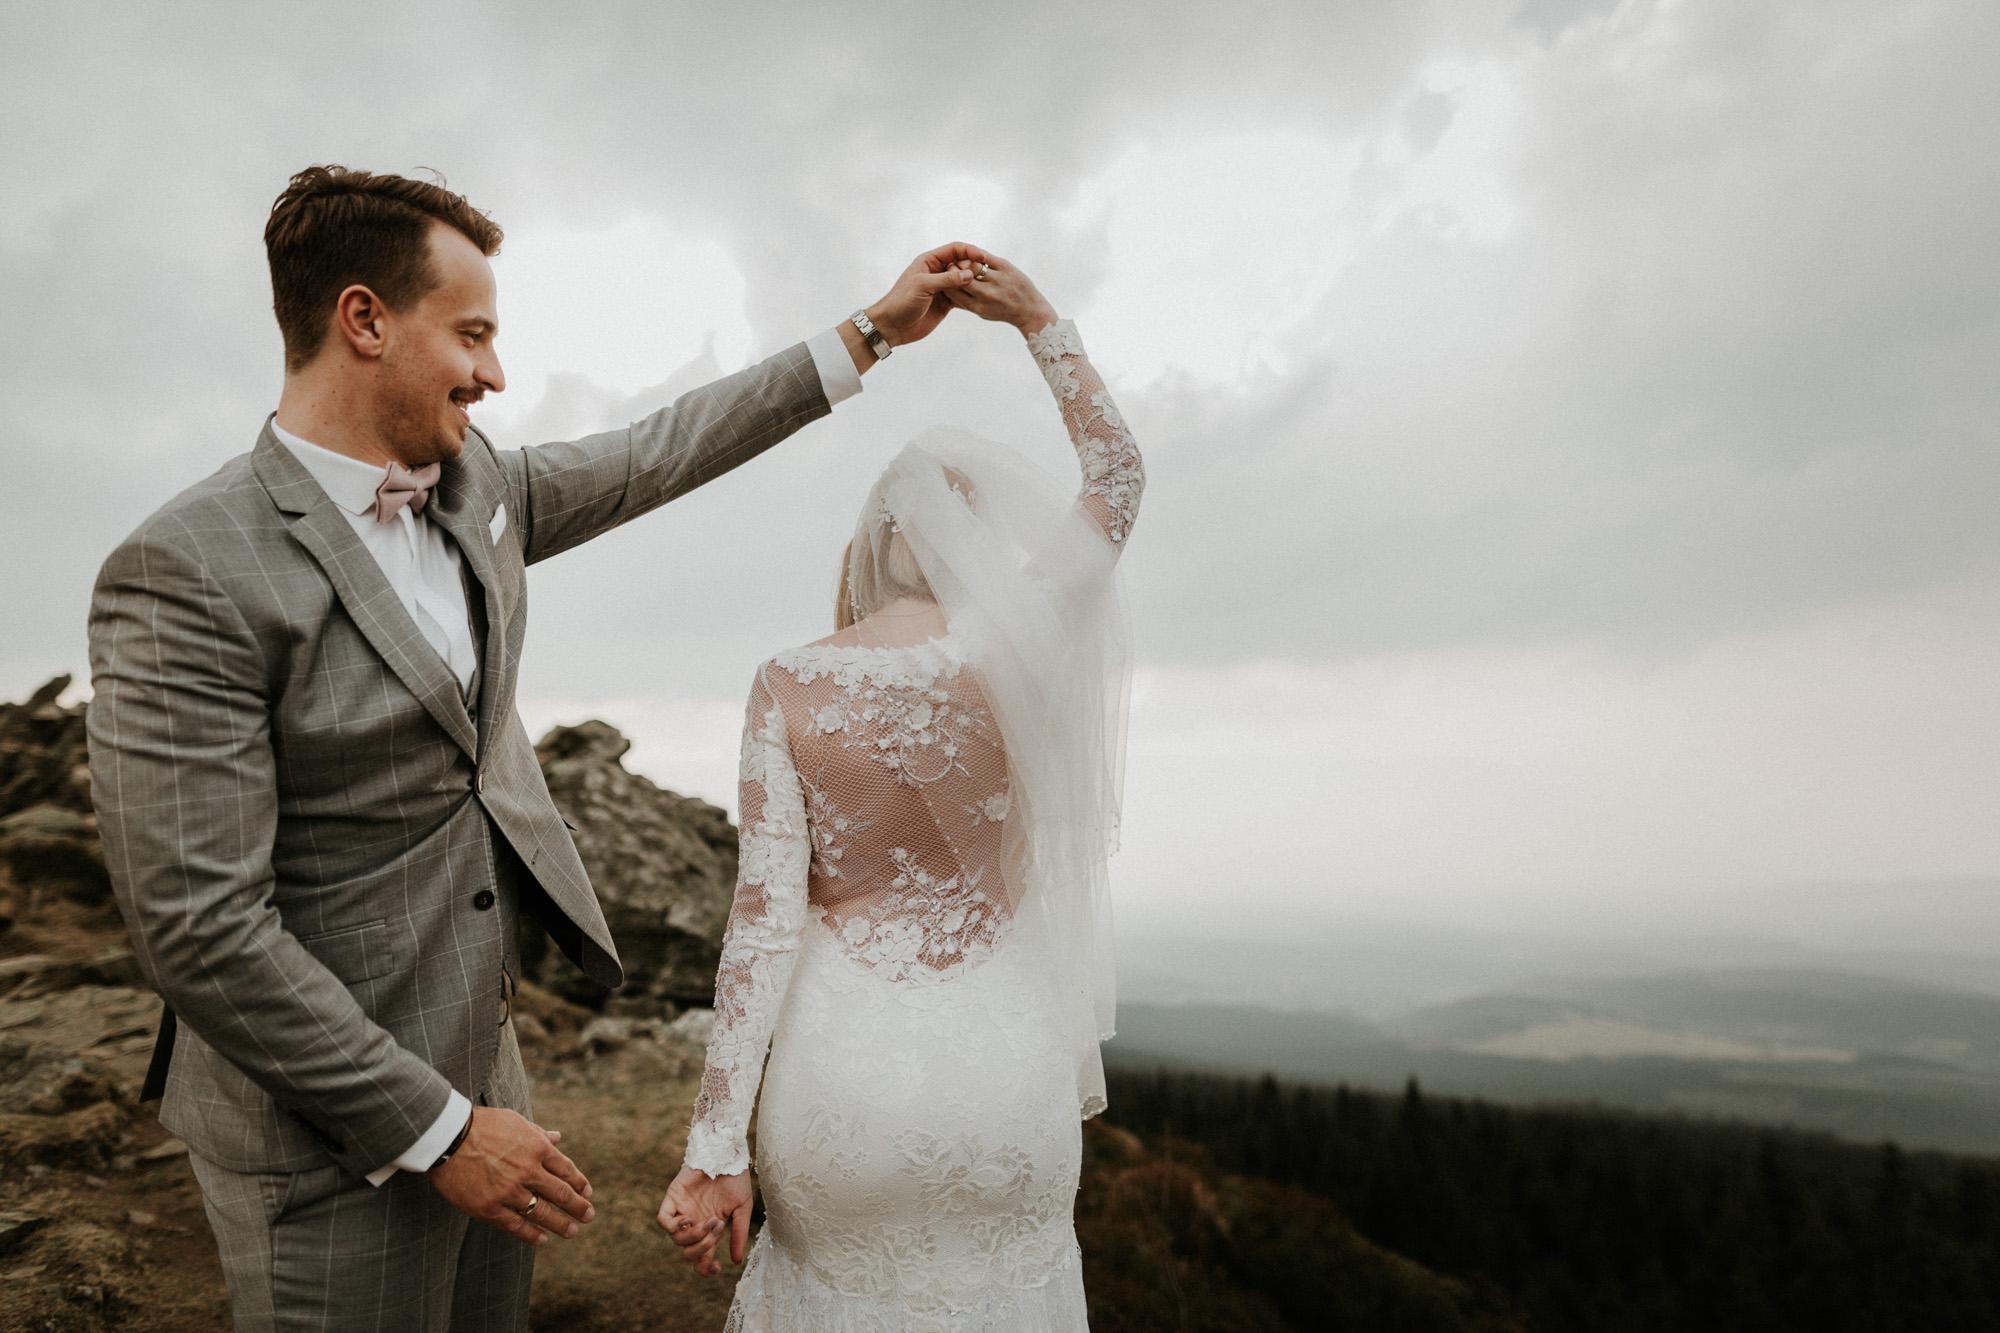 DanielaMarquardtPhotography_Hochzeitsfotograf_Düsseldorf_Köln_Mallorca_Bayern_Austria_Harz_LinaundMaik_Afterwedding-Shooting_Weddingphotographer_Ibiza_Tuskany_Italien_Toskana52